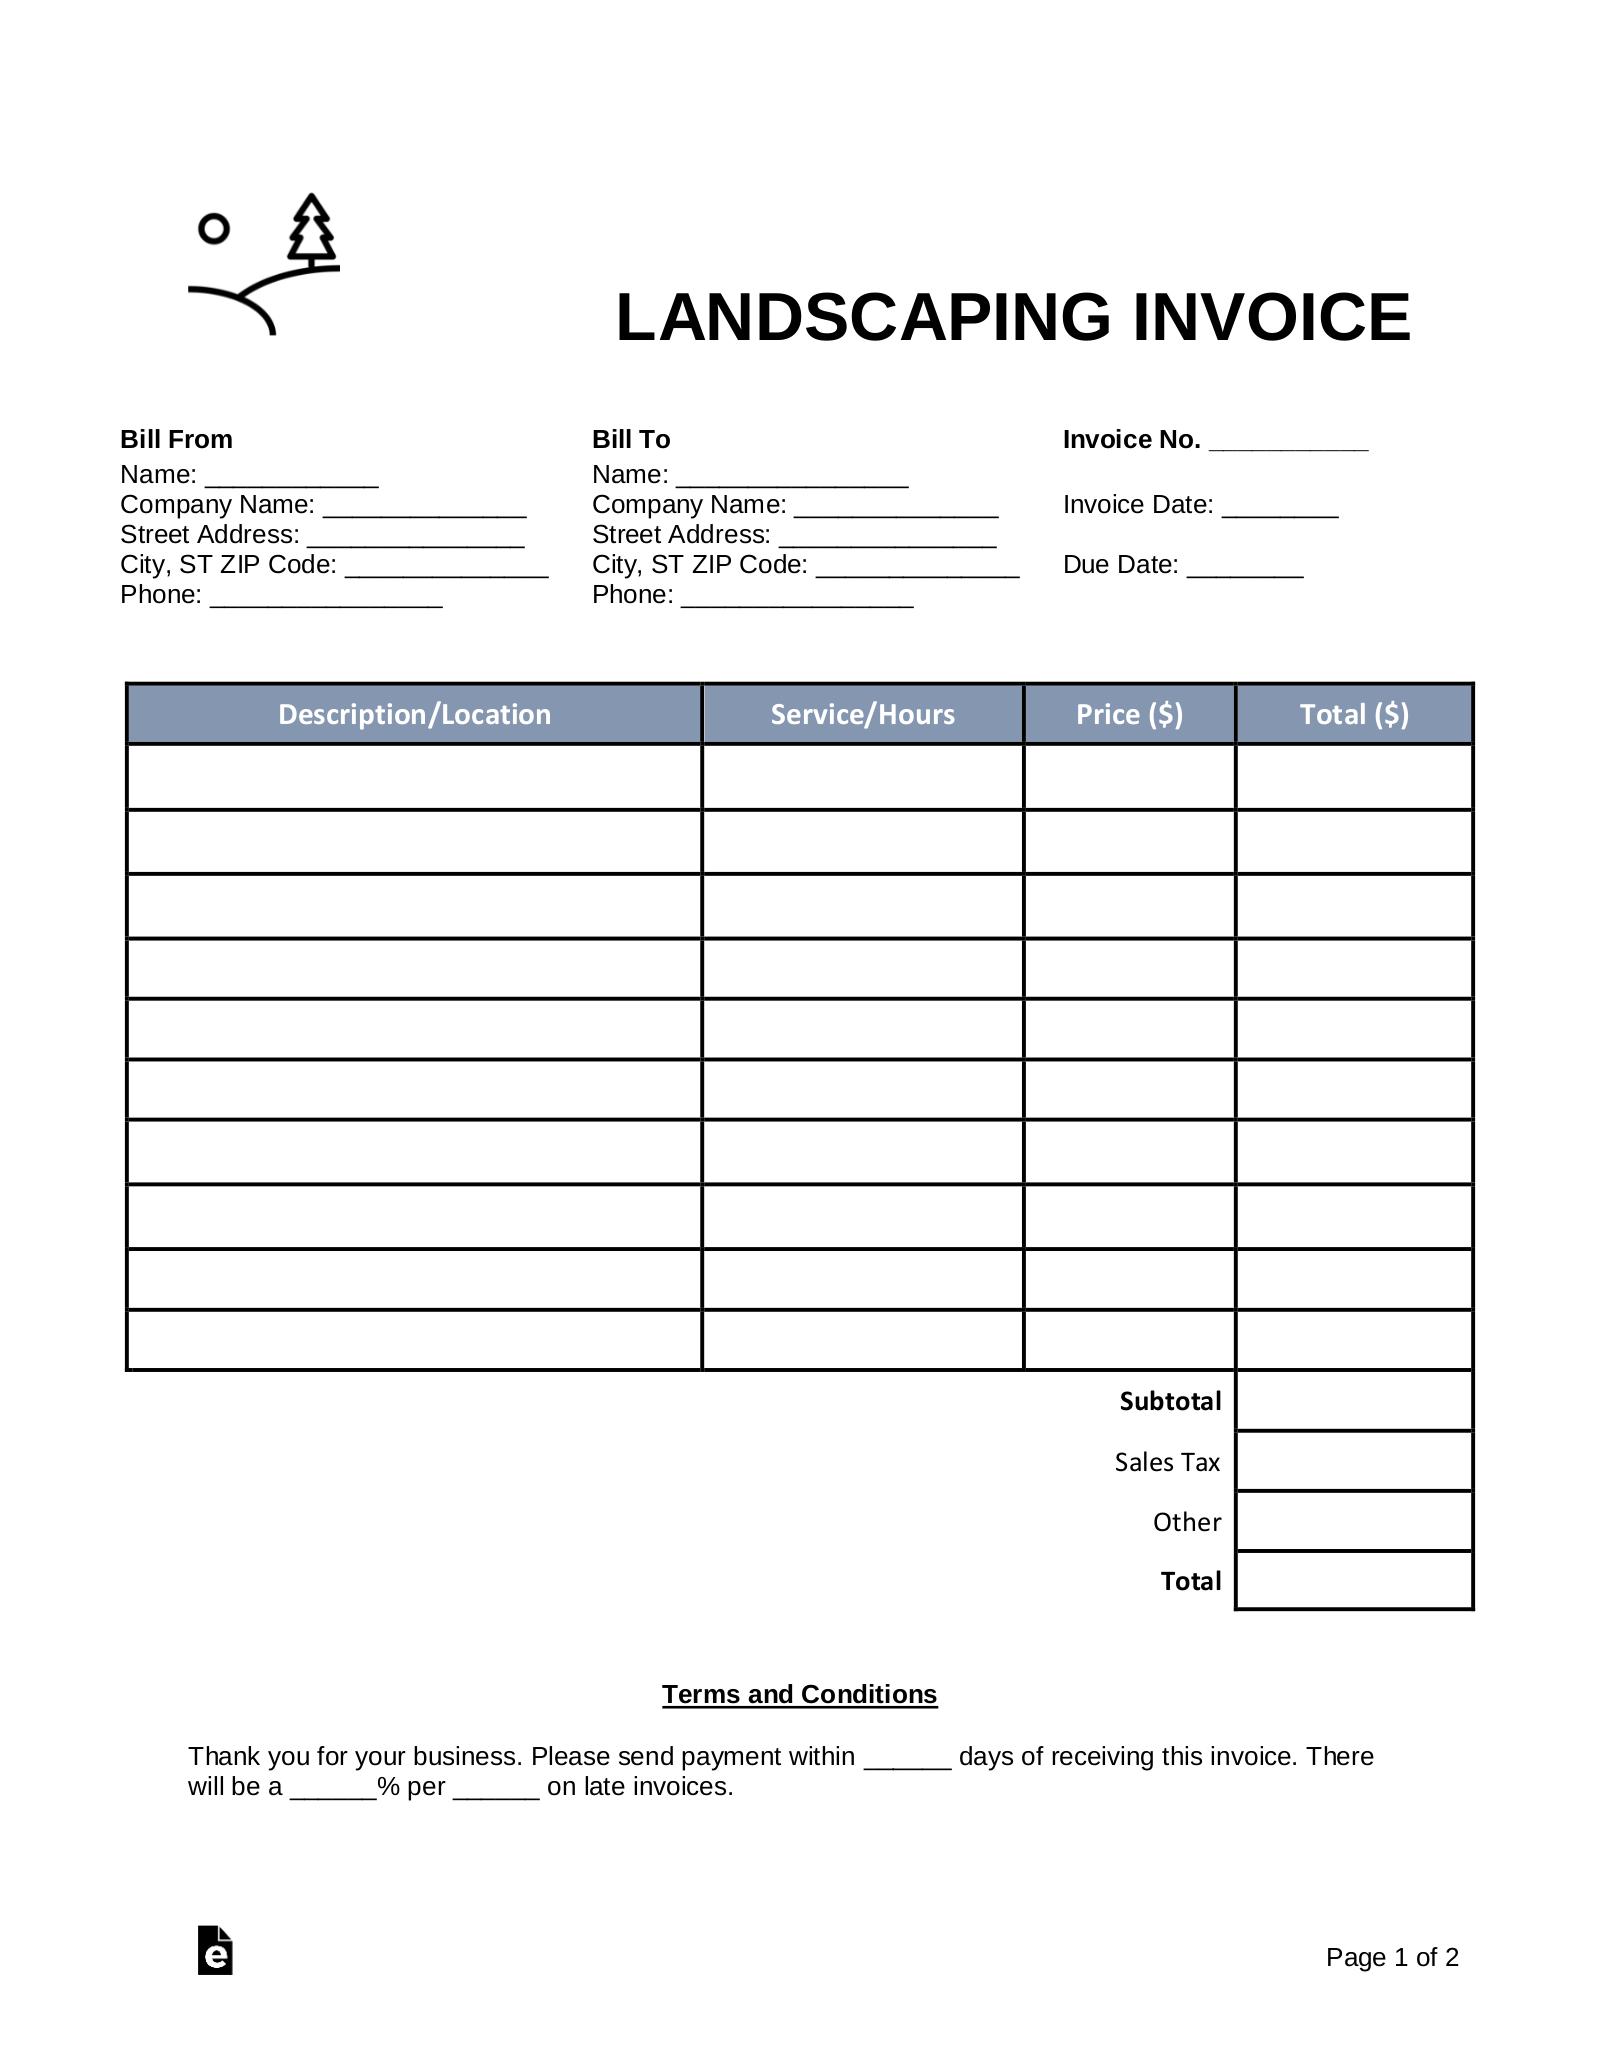 free landscaping invoice template word pdf eforms. Black Bedroom Furniture Sets. Home Design Ideas